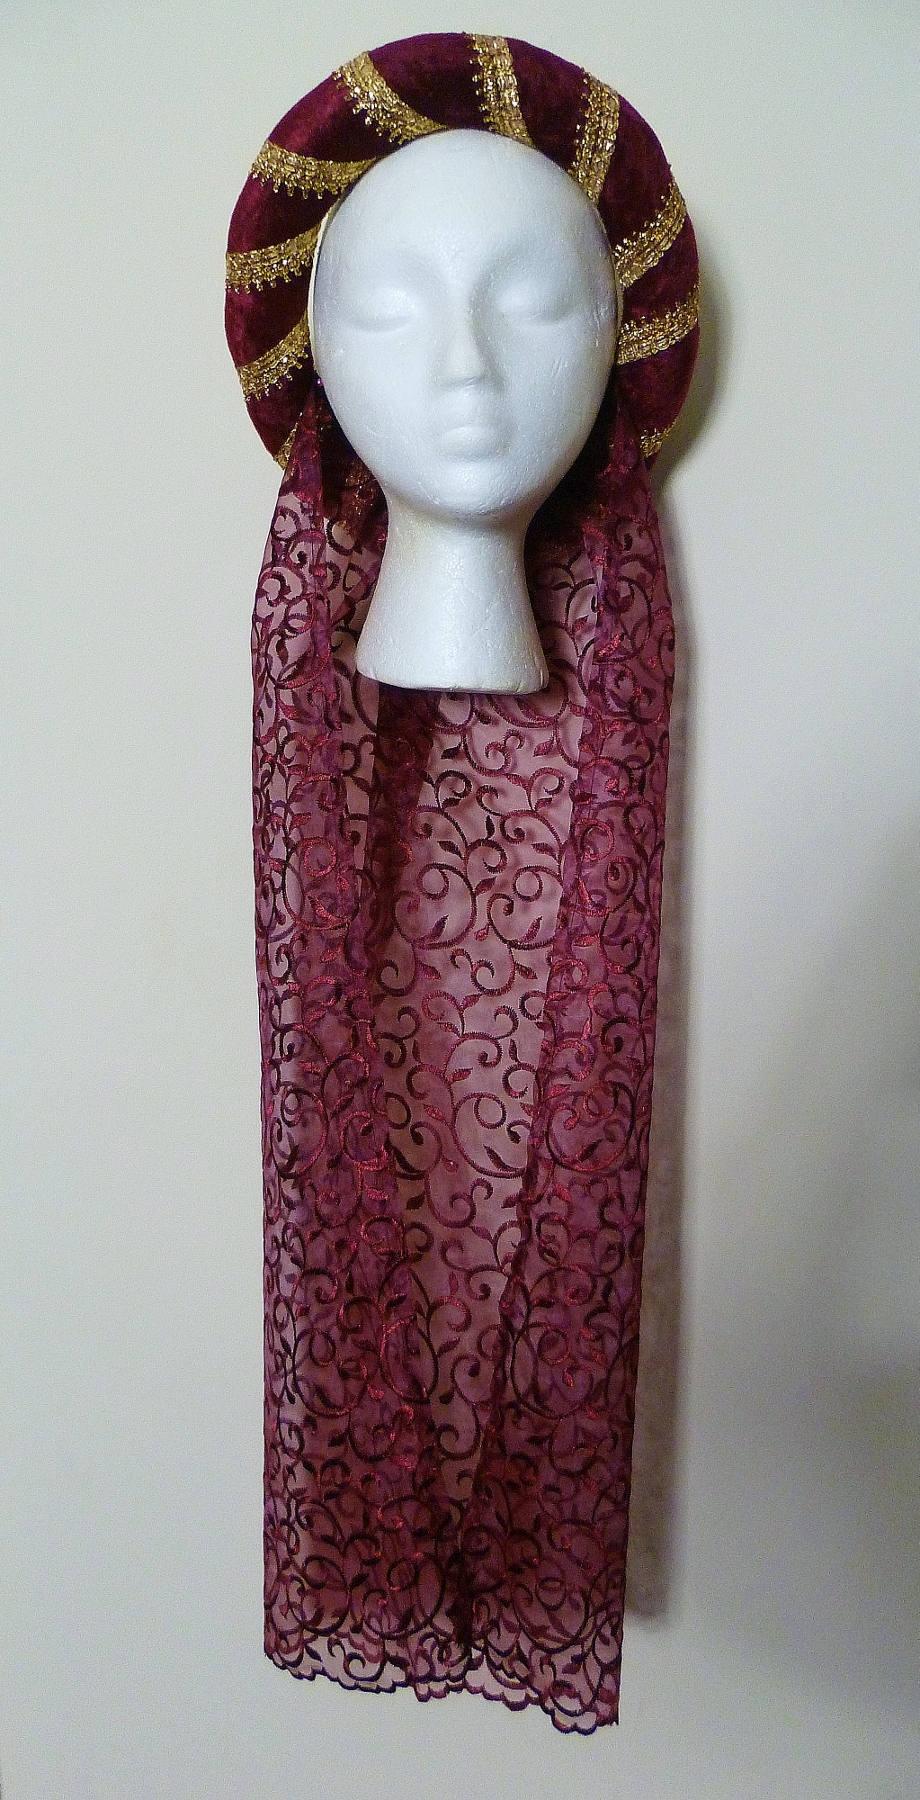 Pagan Headdress Renaissance Circlet Red Medieval Headdress Gothic Circlet made to order dark red embroidered headpiece